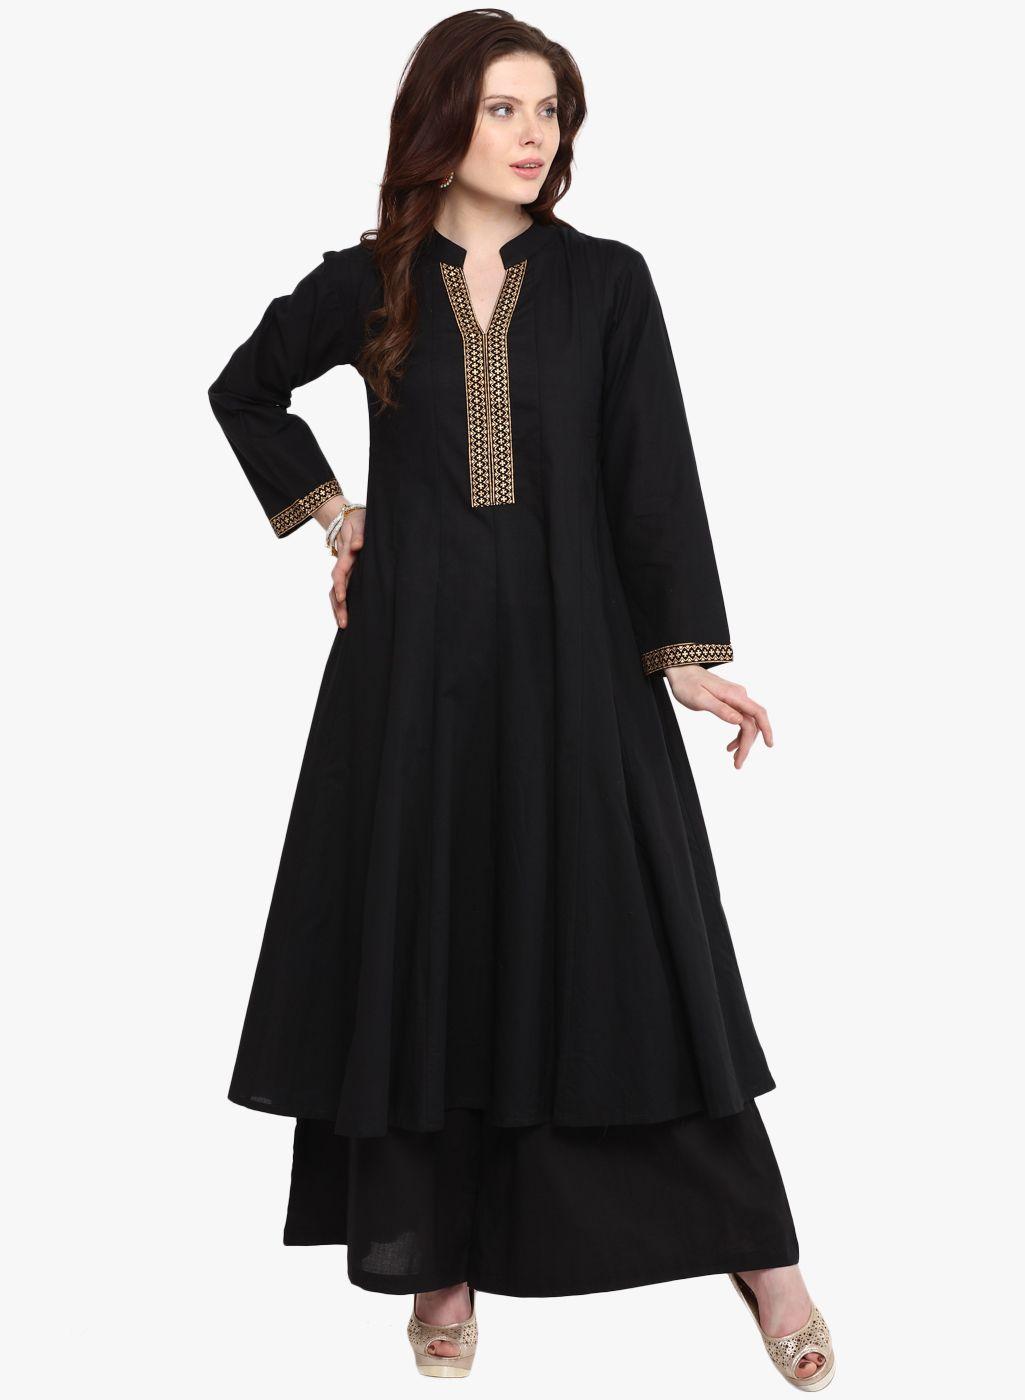 Buy Nayo Black Solid Anarkali for Women Online India, Best Prices, Reviews    NA976WA59EKMINDFAS